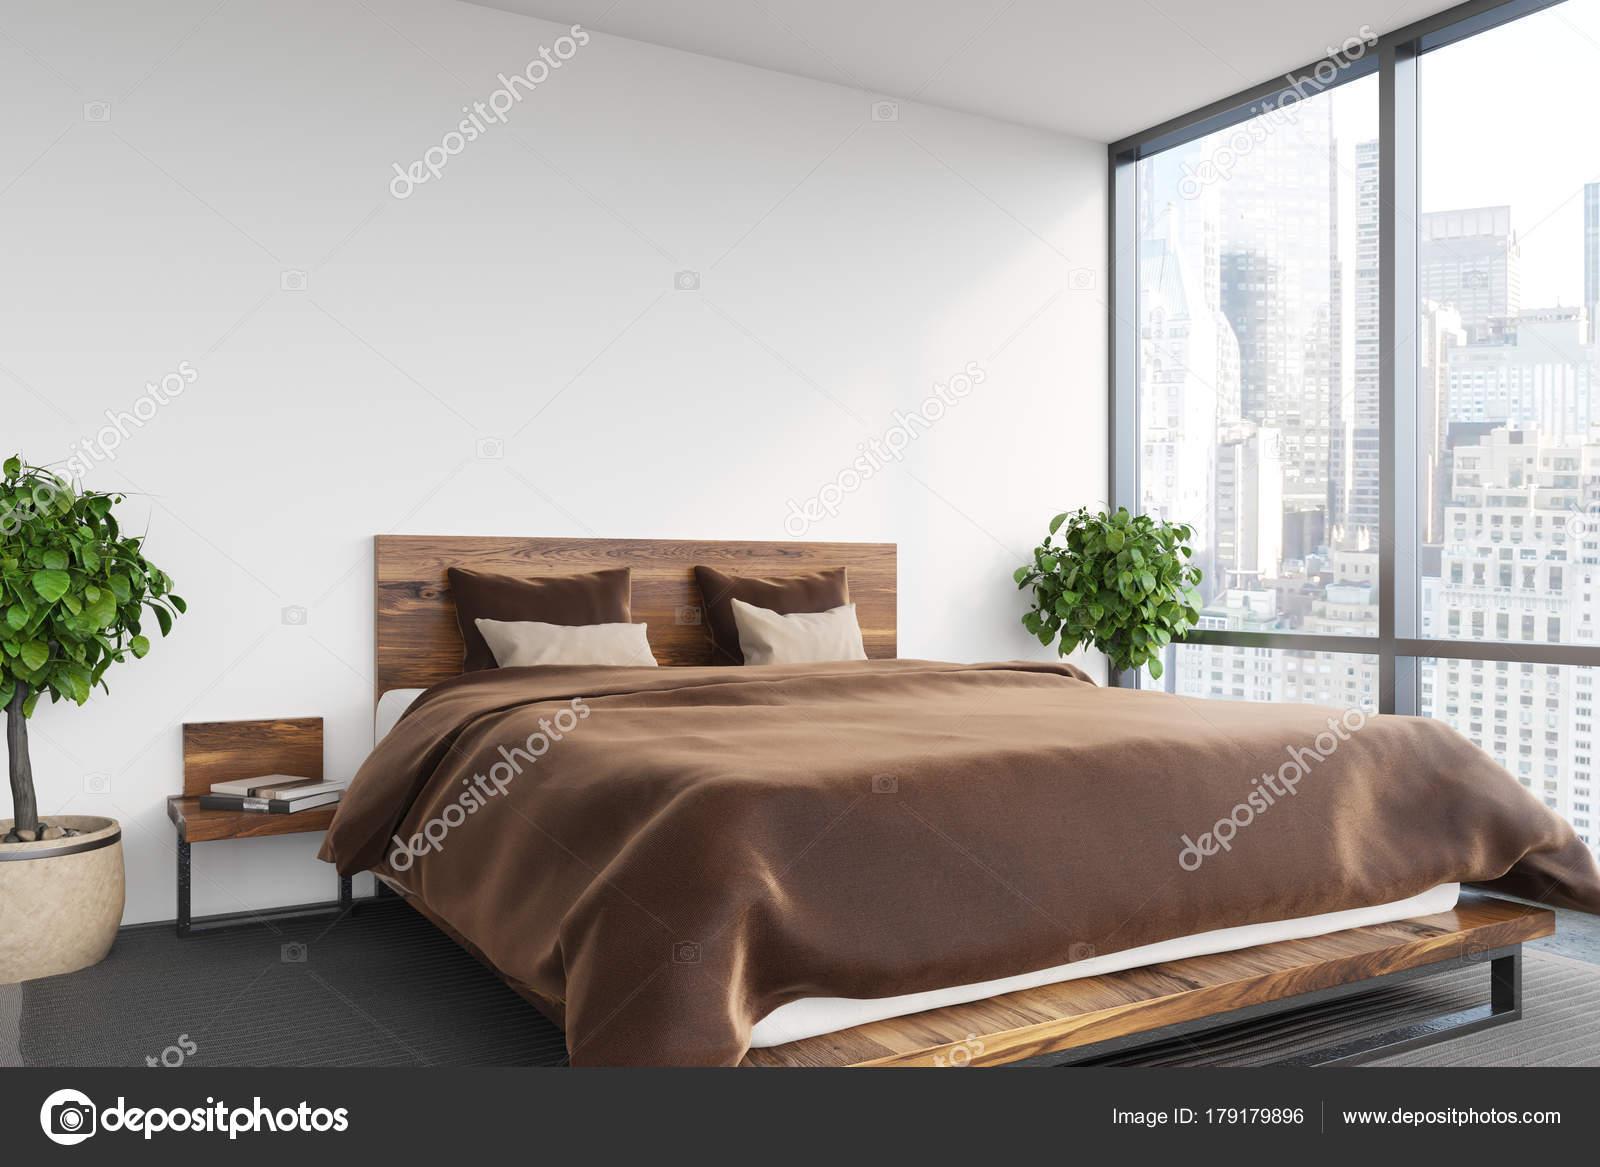 Slaapkamer Bruin Wit : Wit slaapkamer bruin pers bed u stockfoto denisismagilov